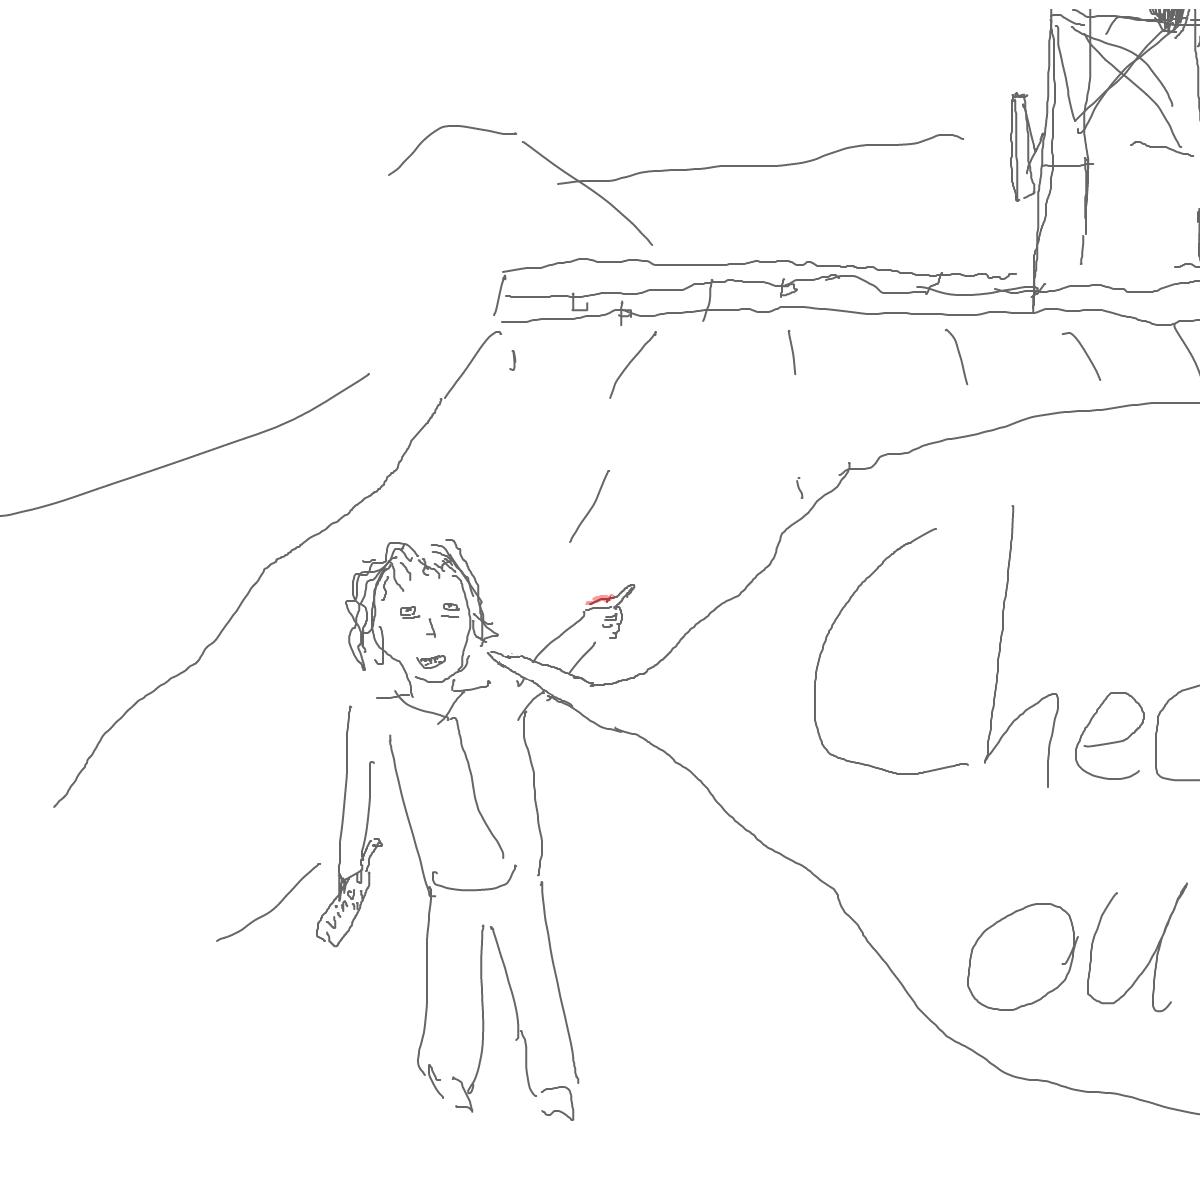 BAAAM drawing#9339 lat:41.7283744812011700lng: 13.2908353805542000